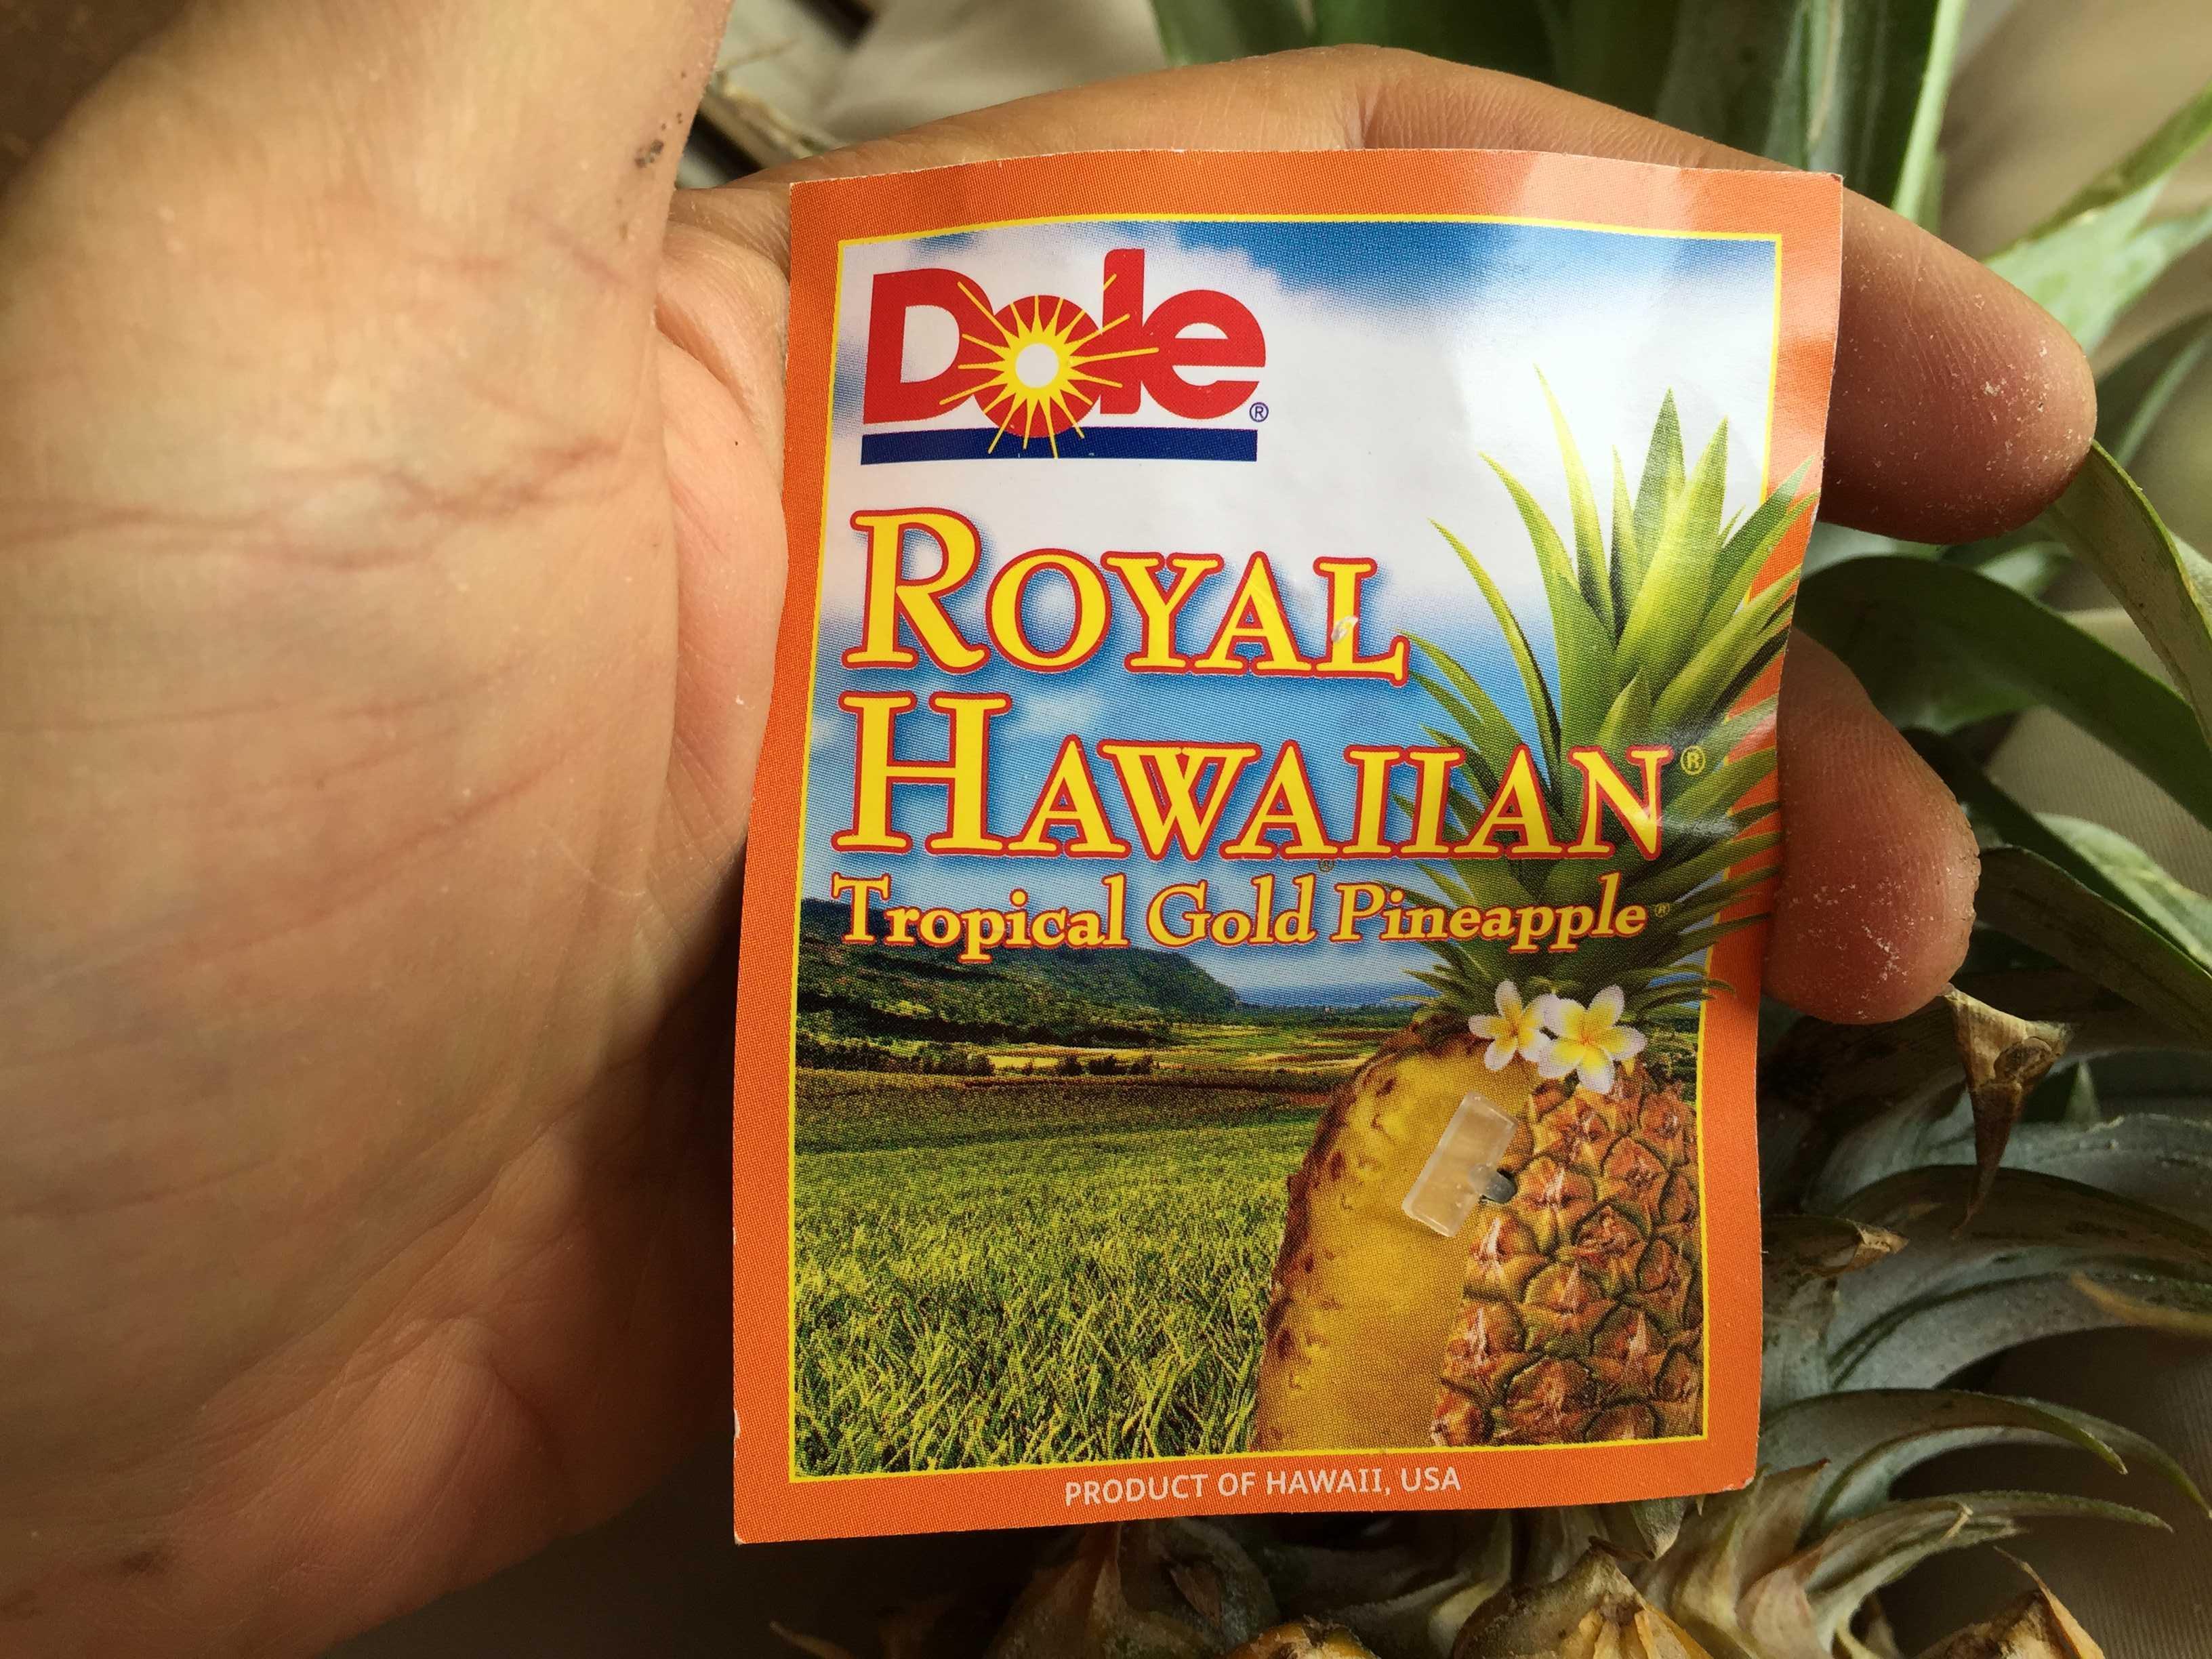 Dole(ドール) ROYAL HAWAIIAN Tropical Gold Pineapple